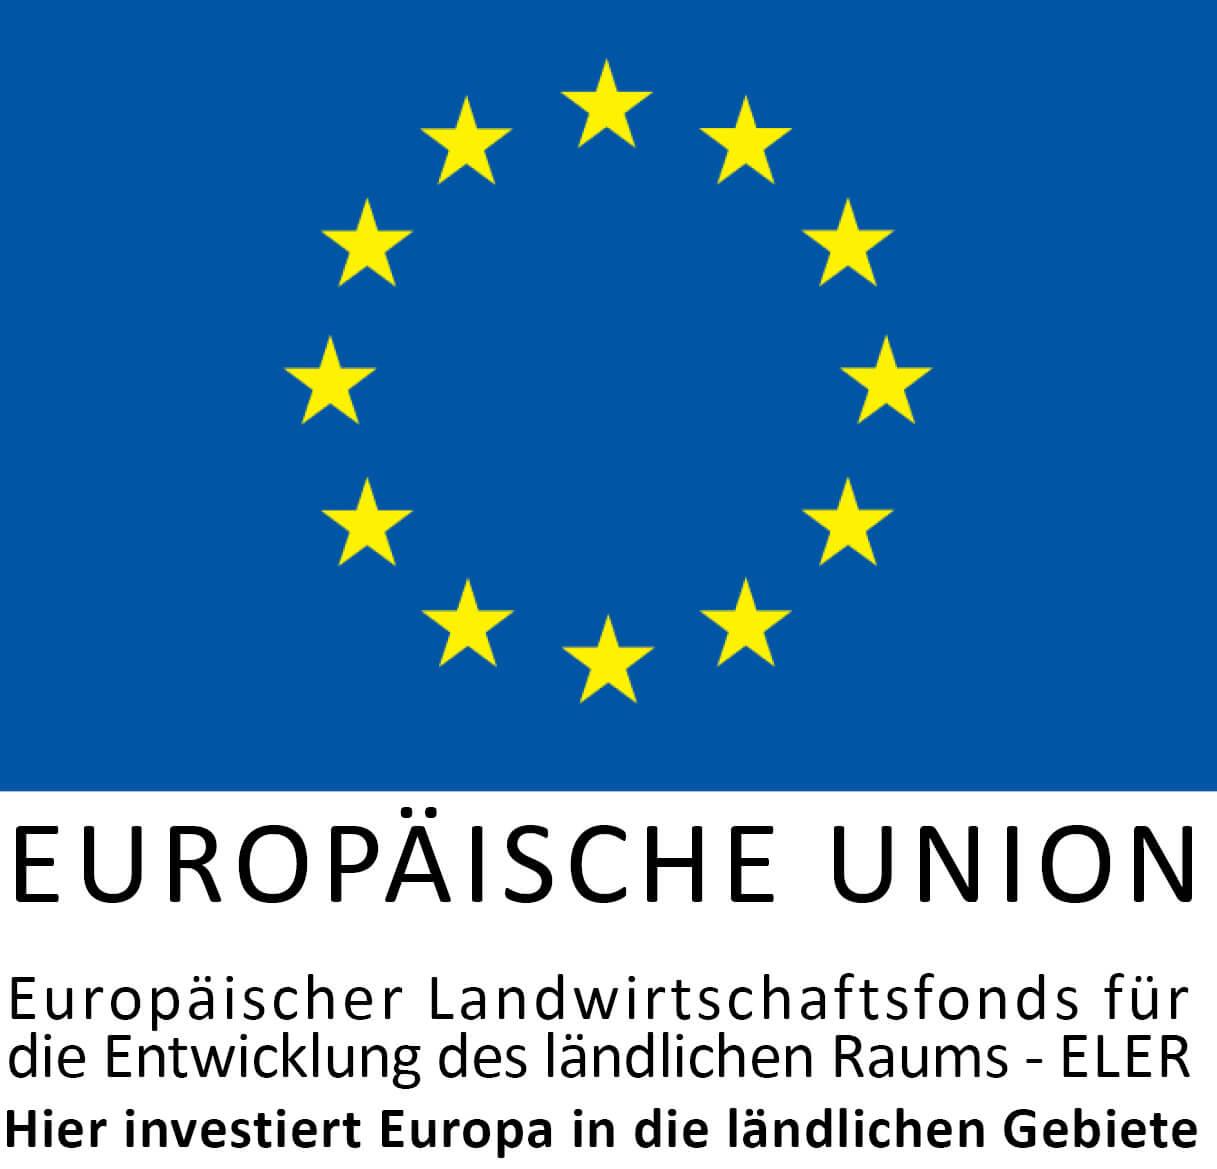 EU Logo: Hier investiert Europa - ELER